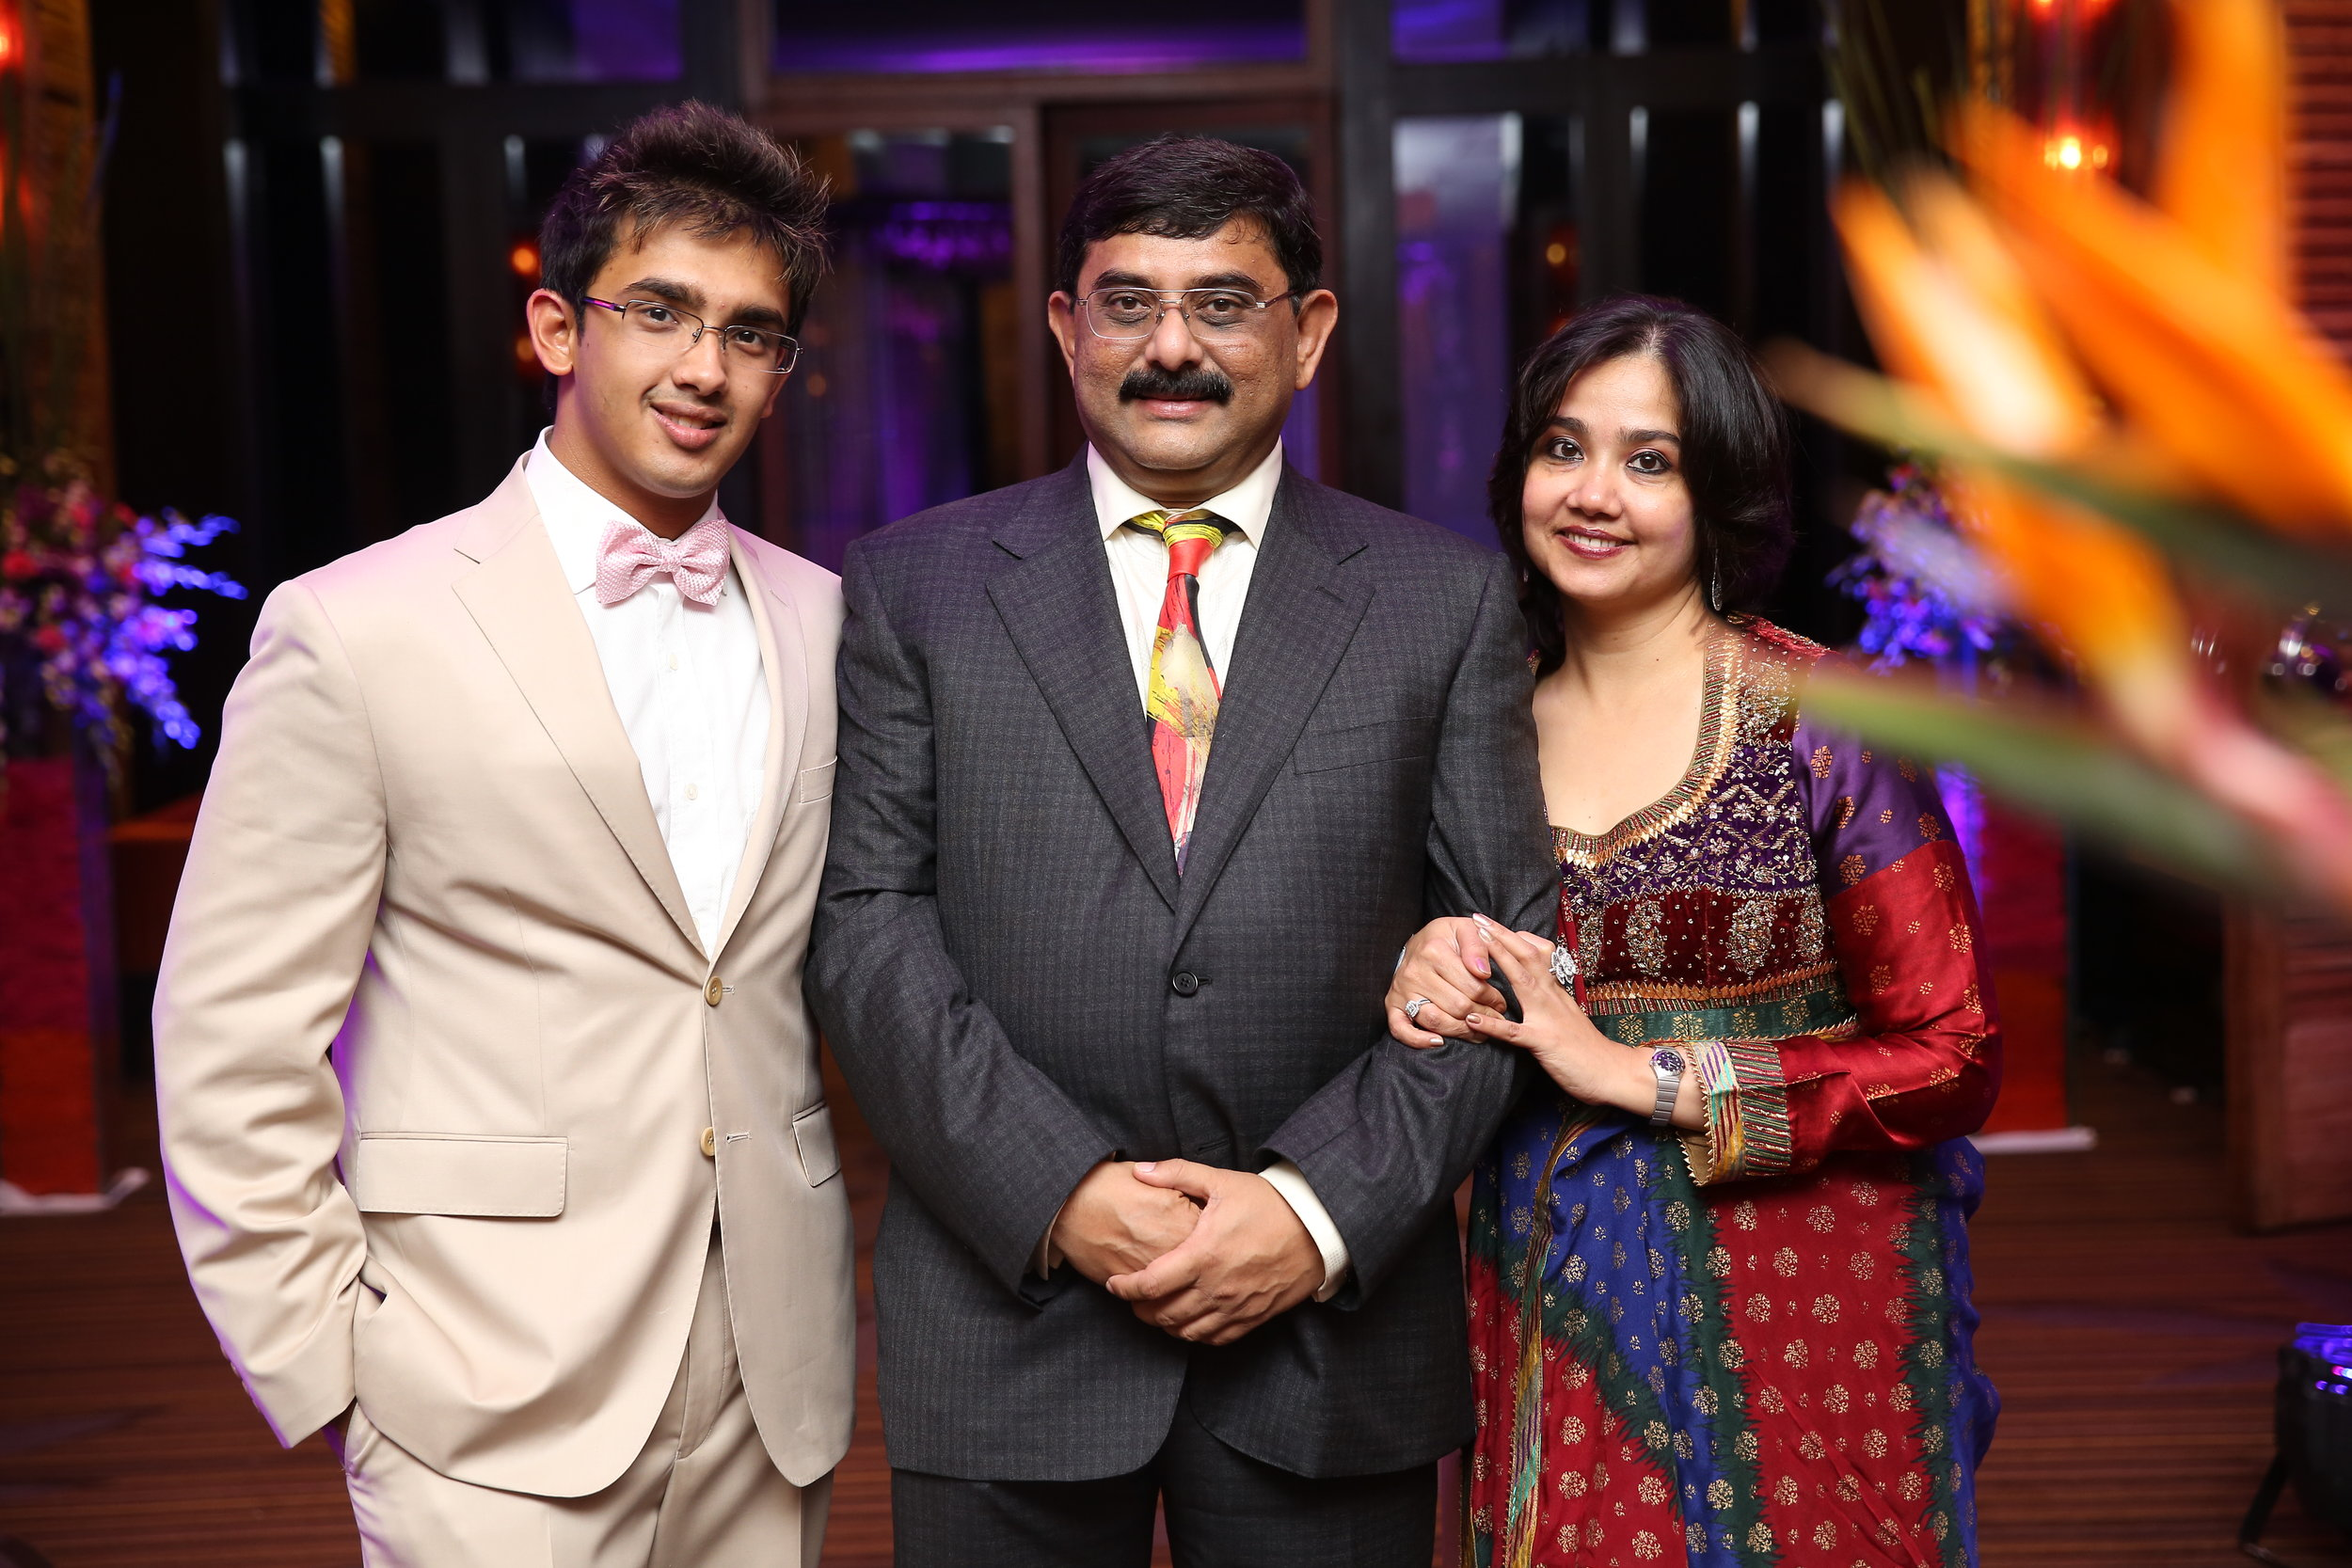 The Founders of AAJ Global Foundation(Left to Right) : Anannya Sengupta, Aparup Sengupta, Jaya Sengupta